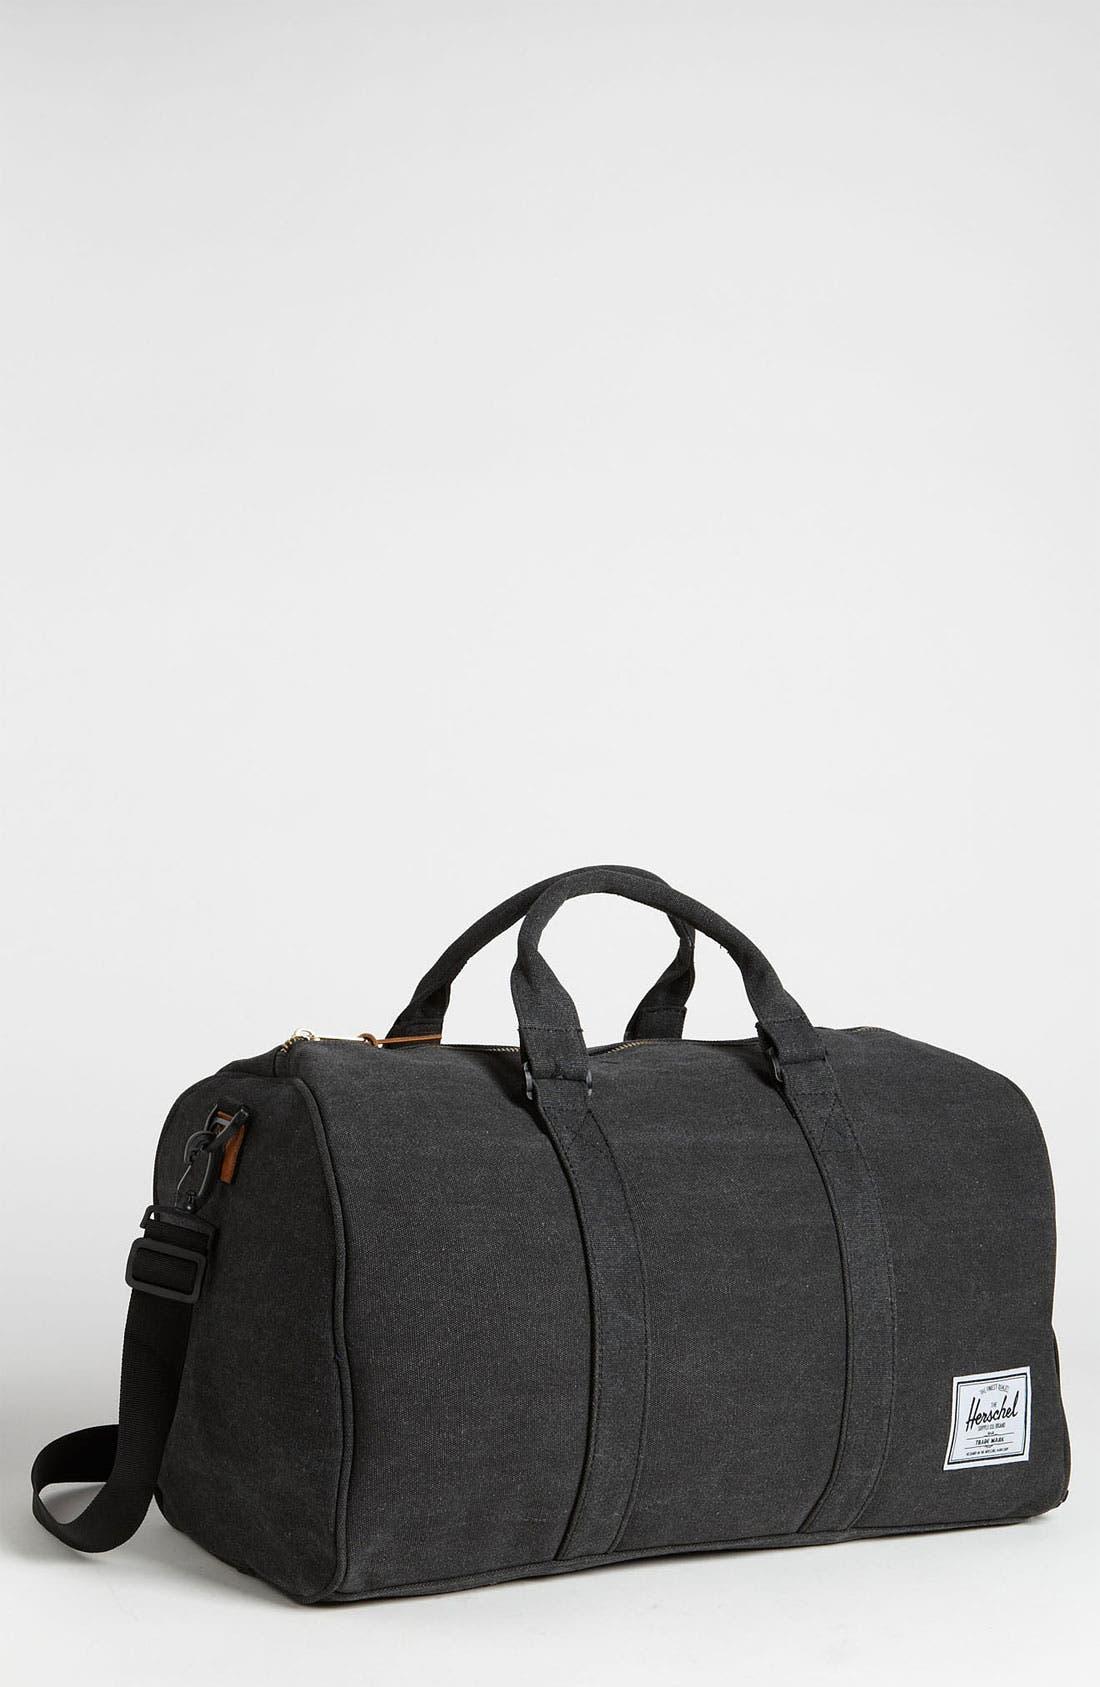 Alternate Image 1 Selected - Herschel Supply Co. 'Novel' Duffel Bag